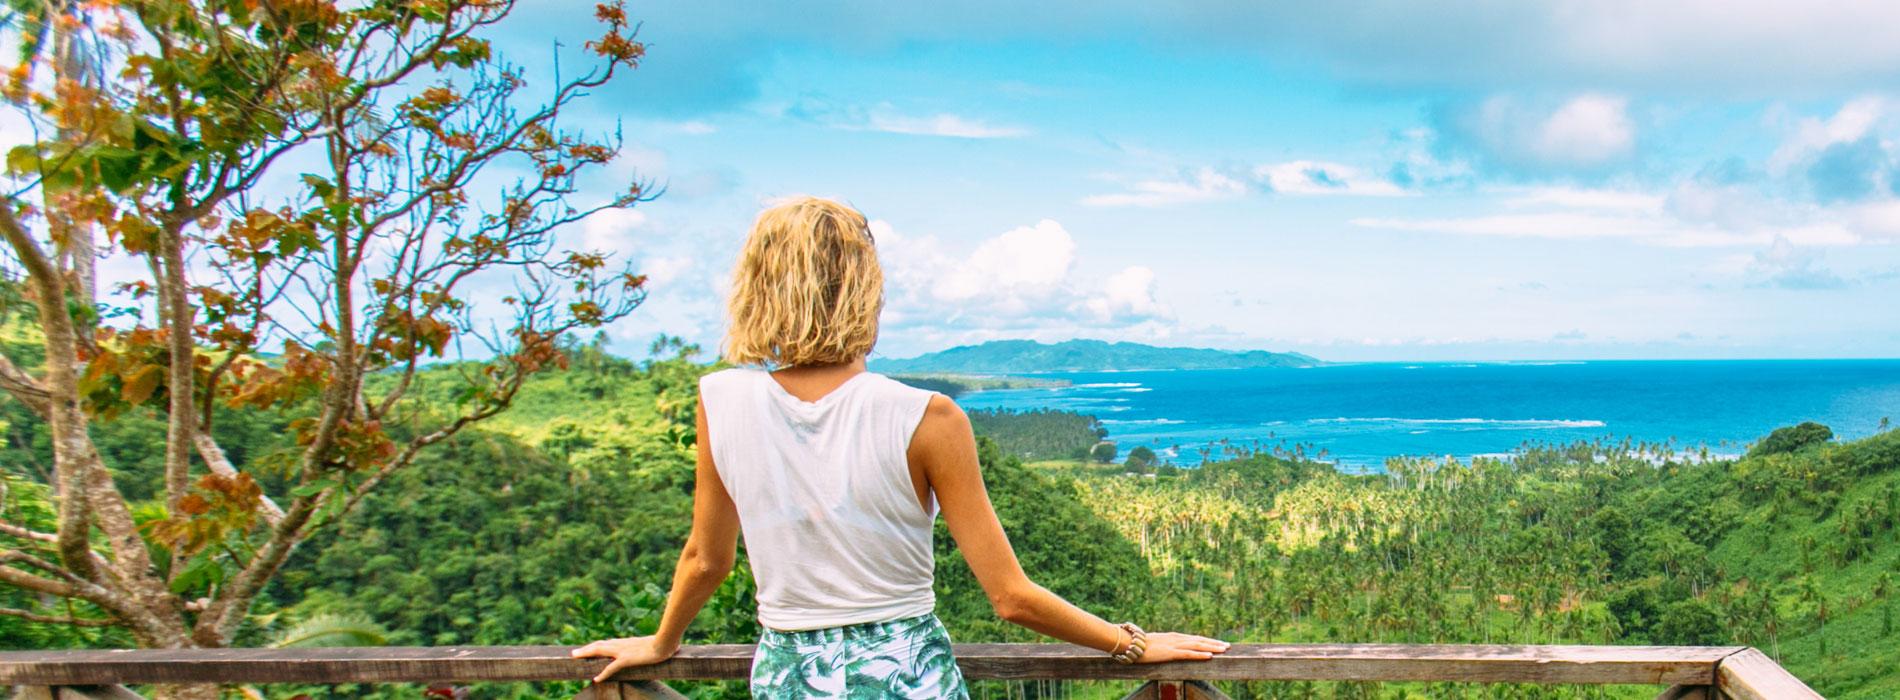 qamea fiji resort review